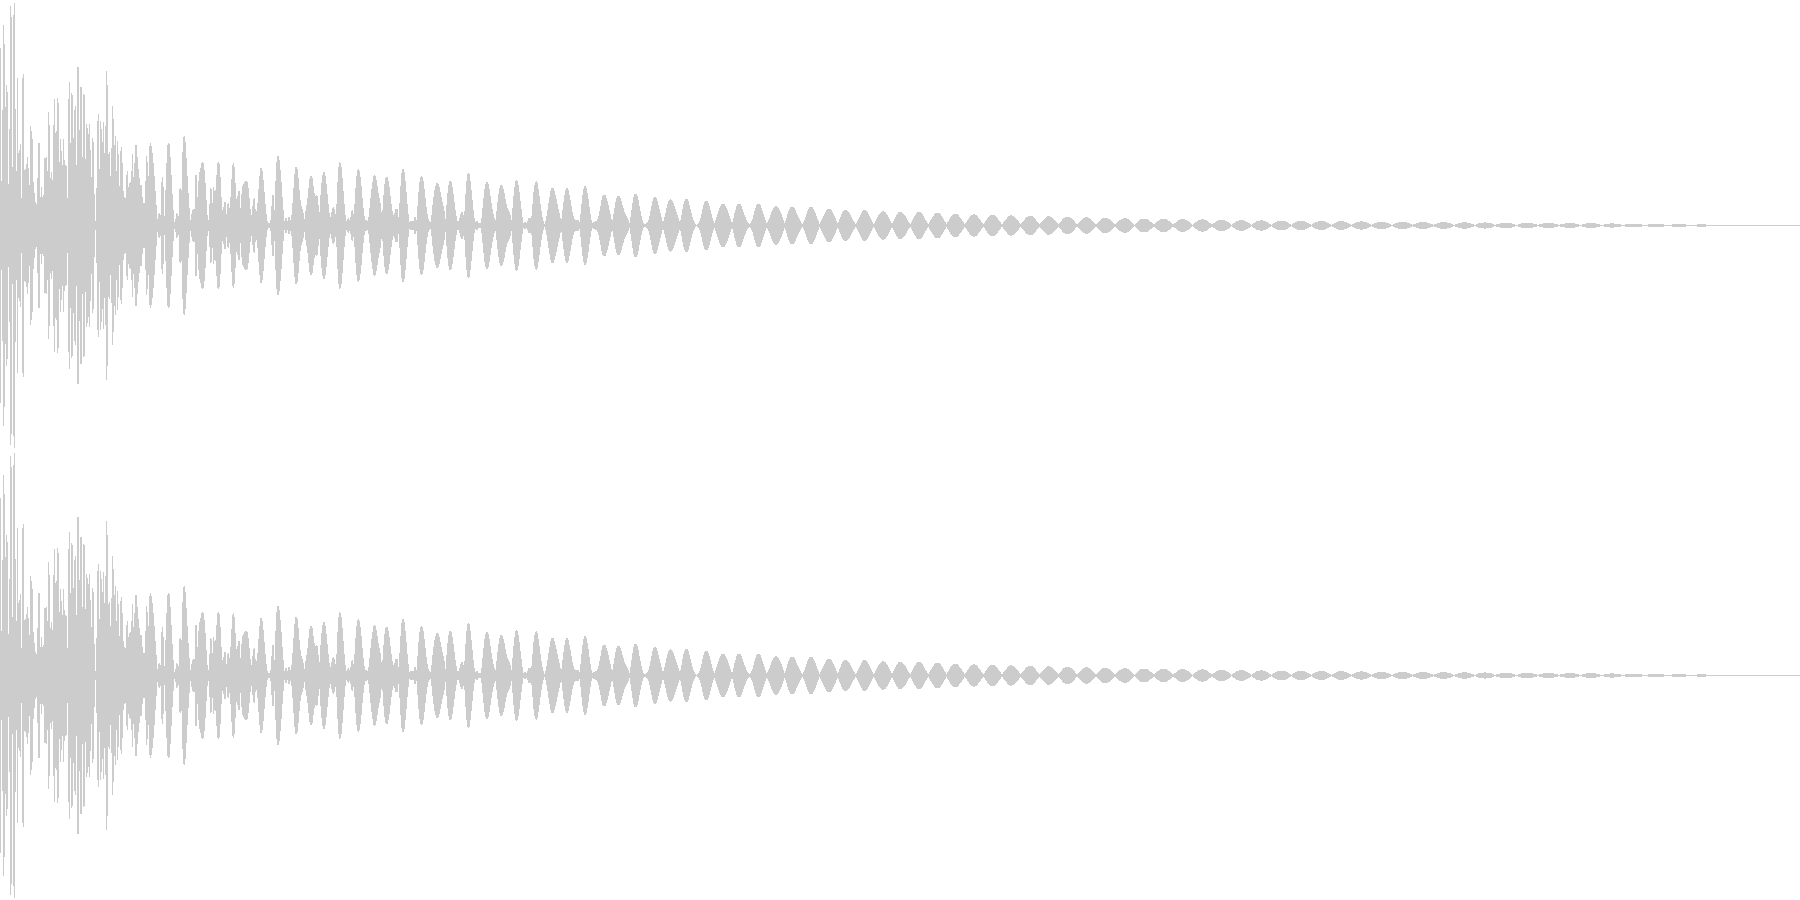 DTM Tom 5 オリジナル音源の未再生の波形